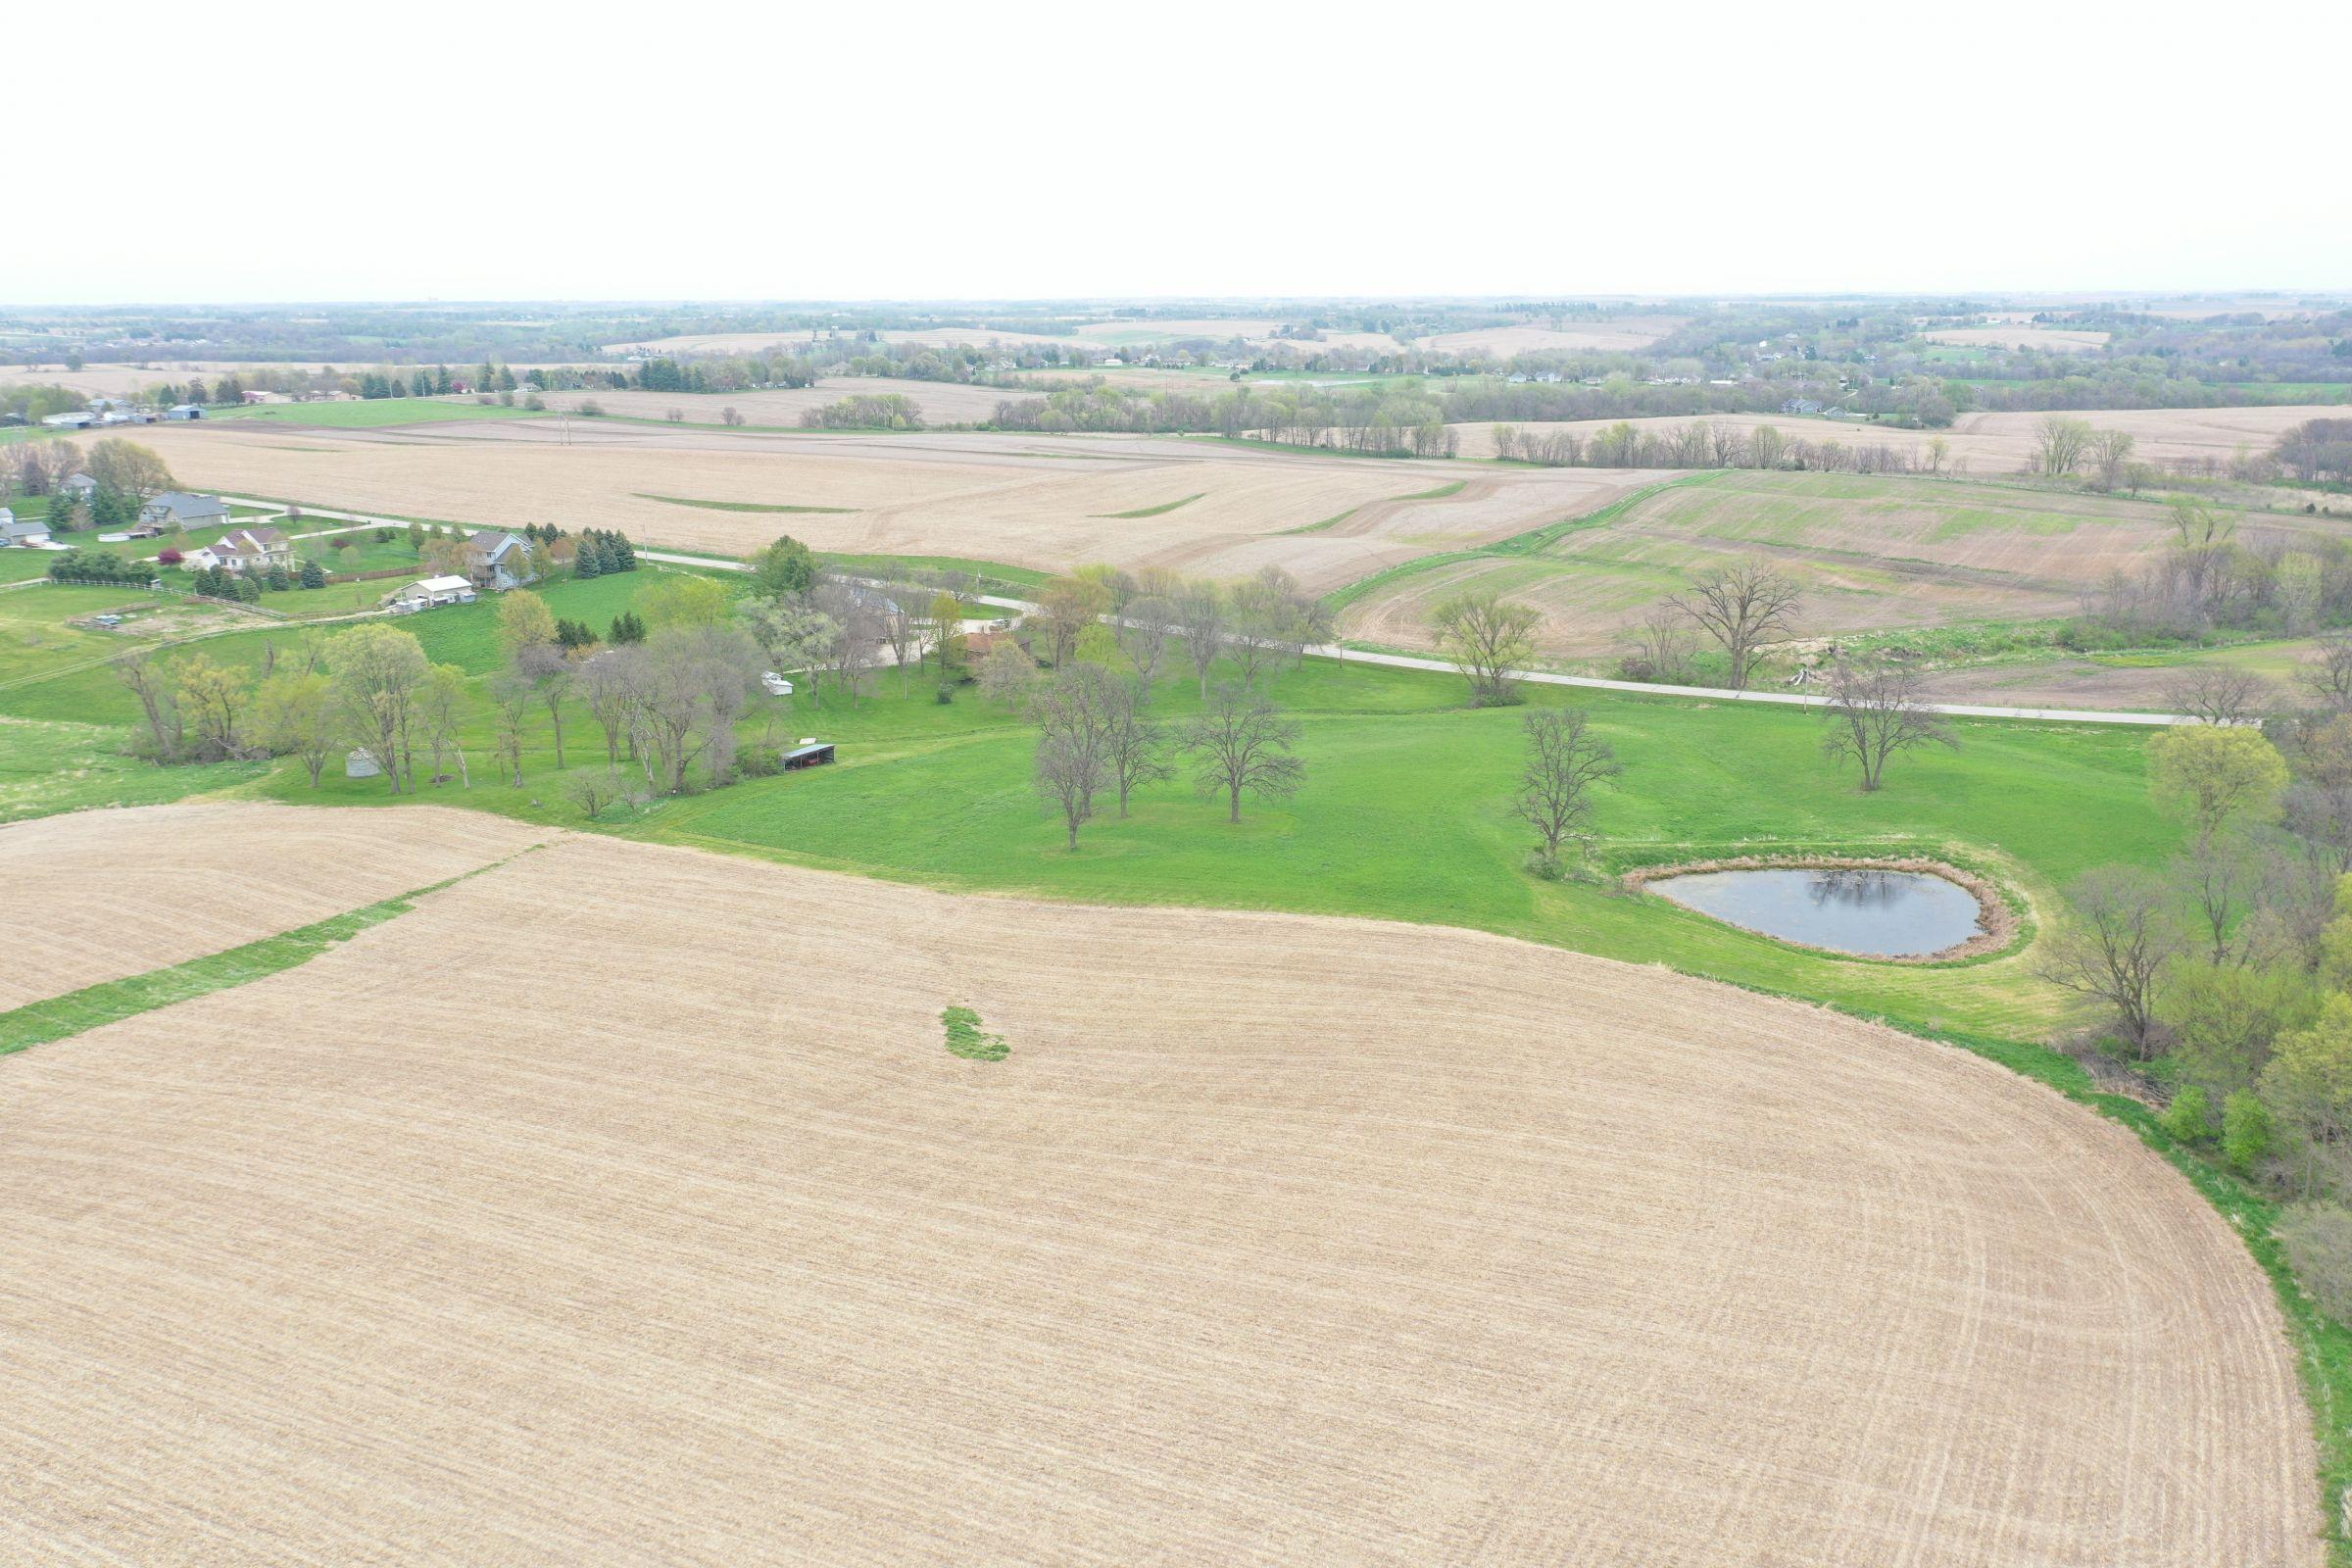 residential-polk-county-iowa-34-acres-listing-number-15502-4-2021-04-29-143446.JPG